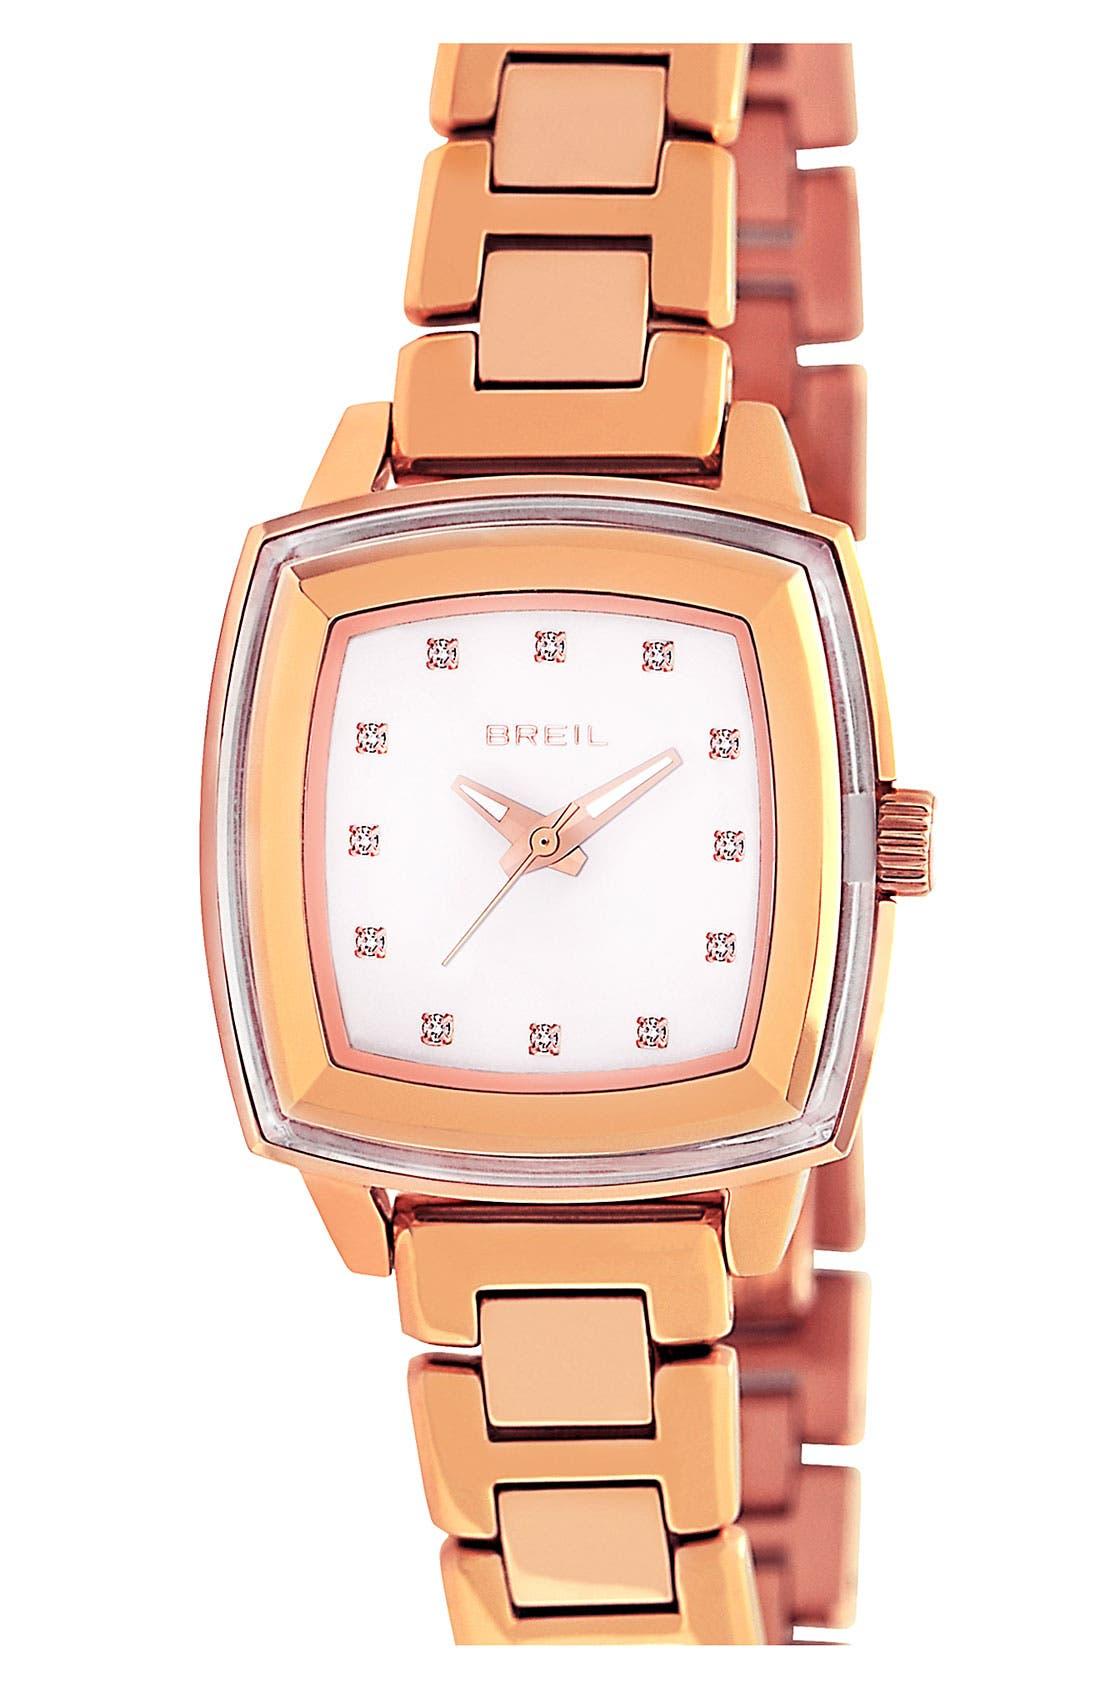 Main Image - Breil 'Orchestra' Square Case Bracelet Watch, 29mm x 36mm